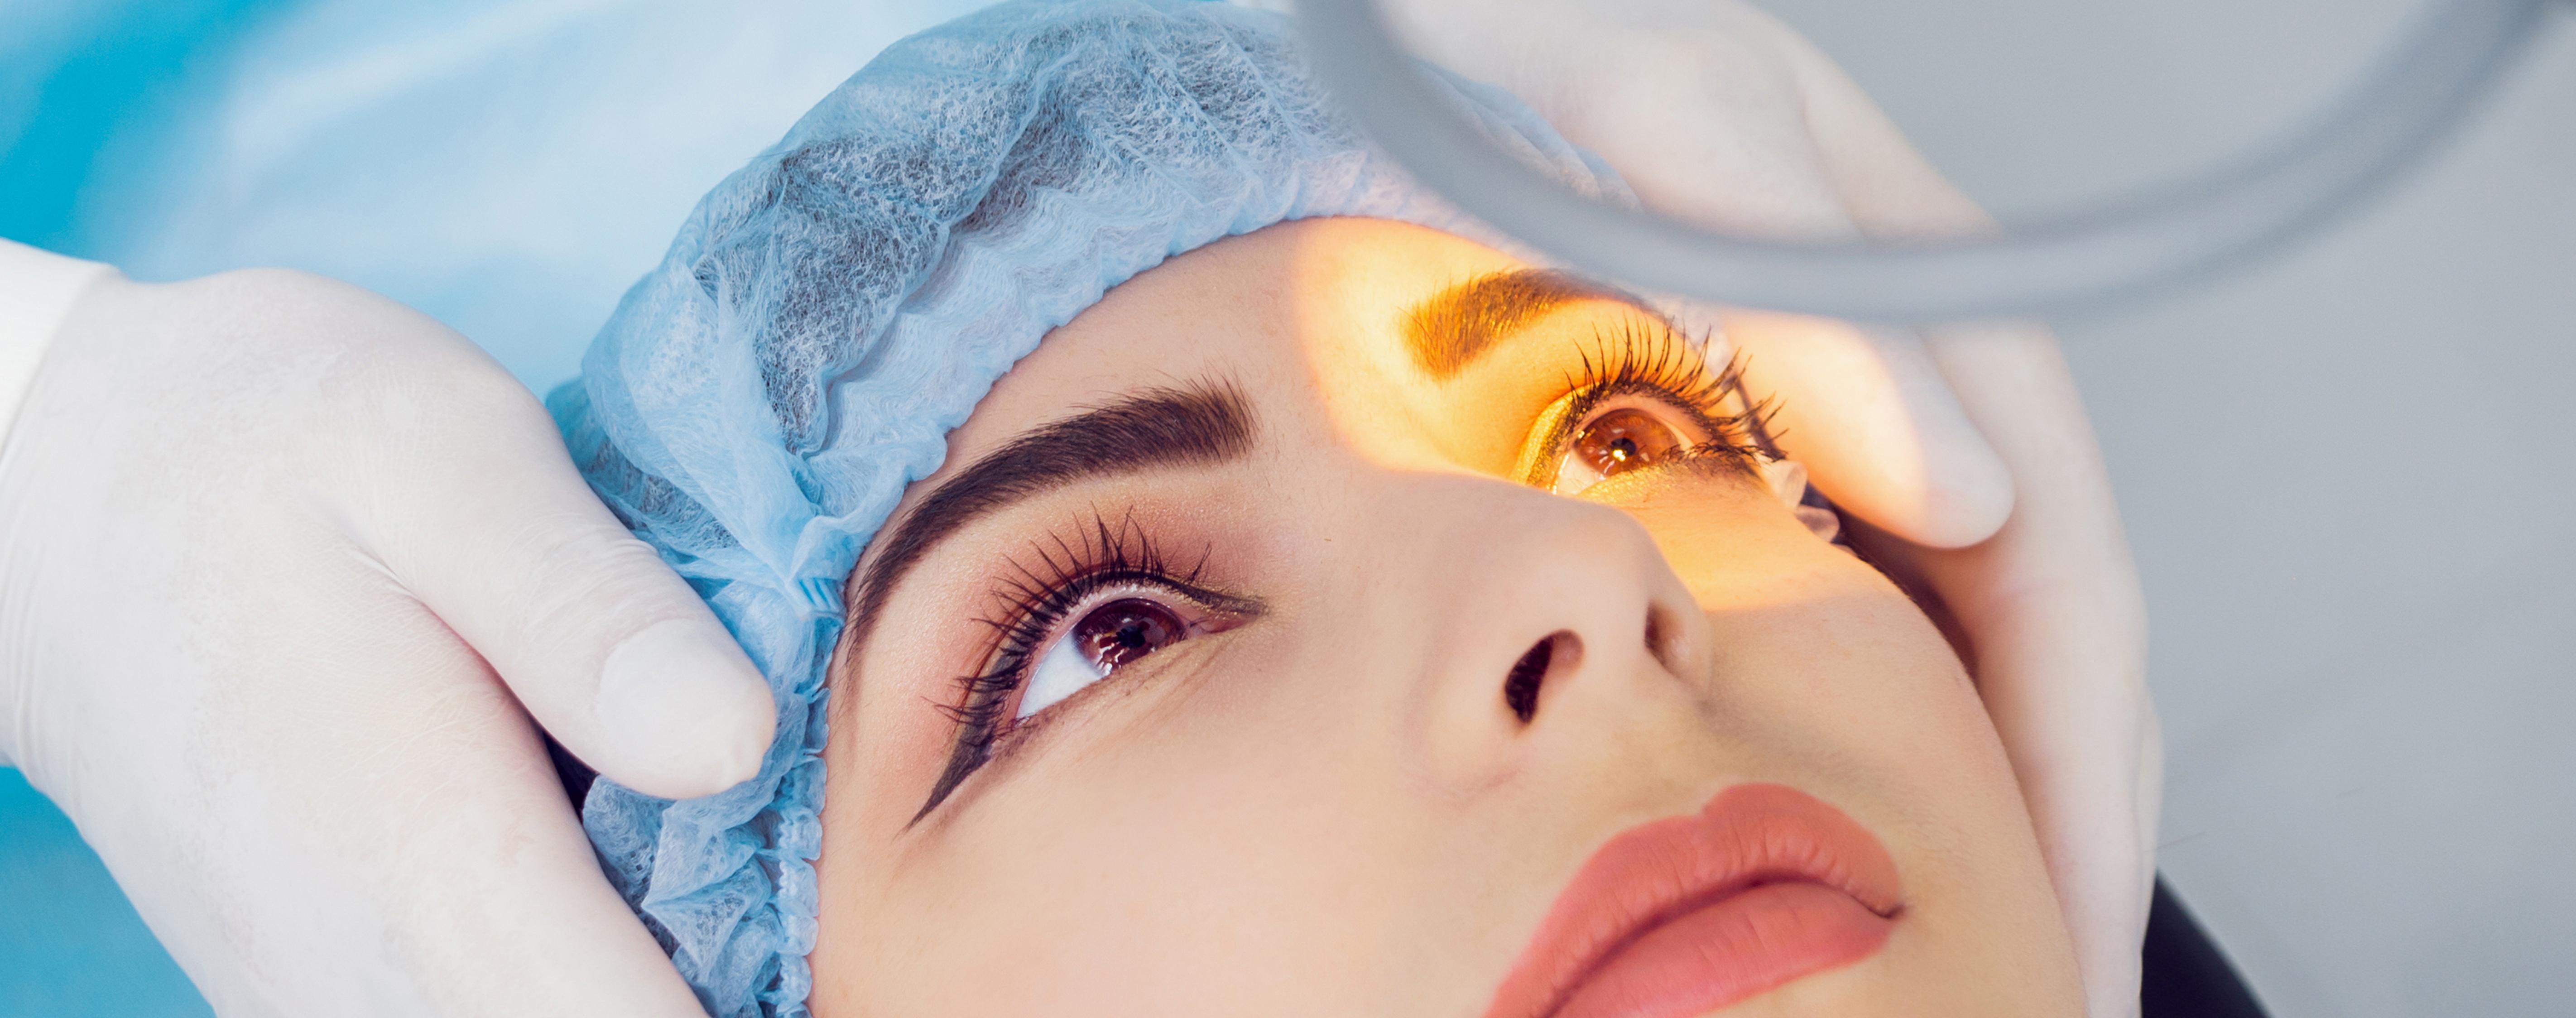 miopia magna operacion